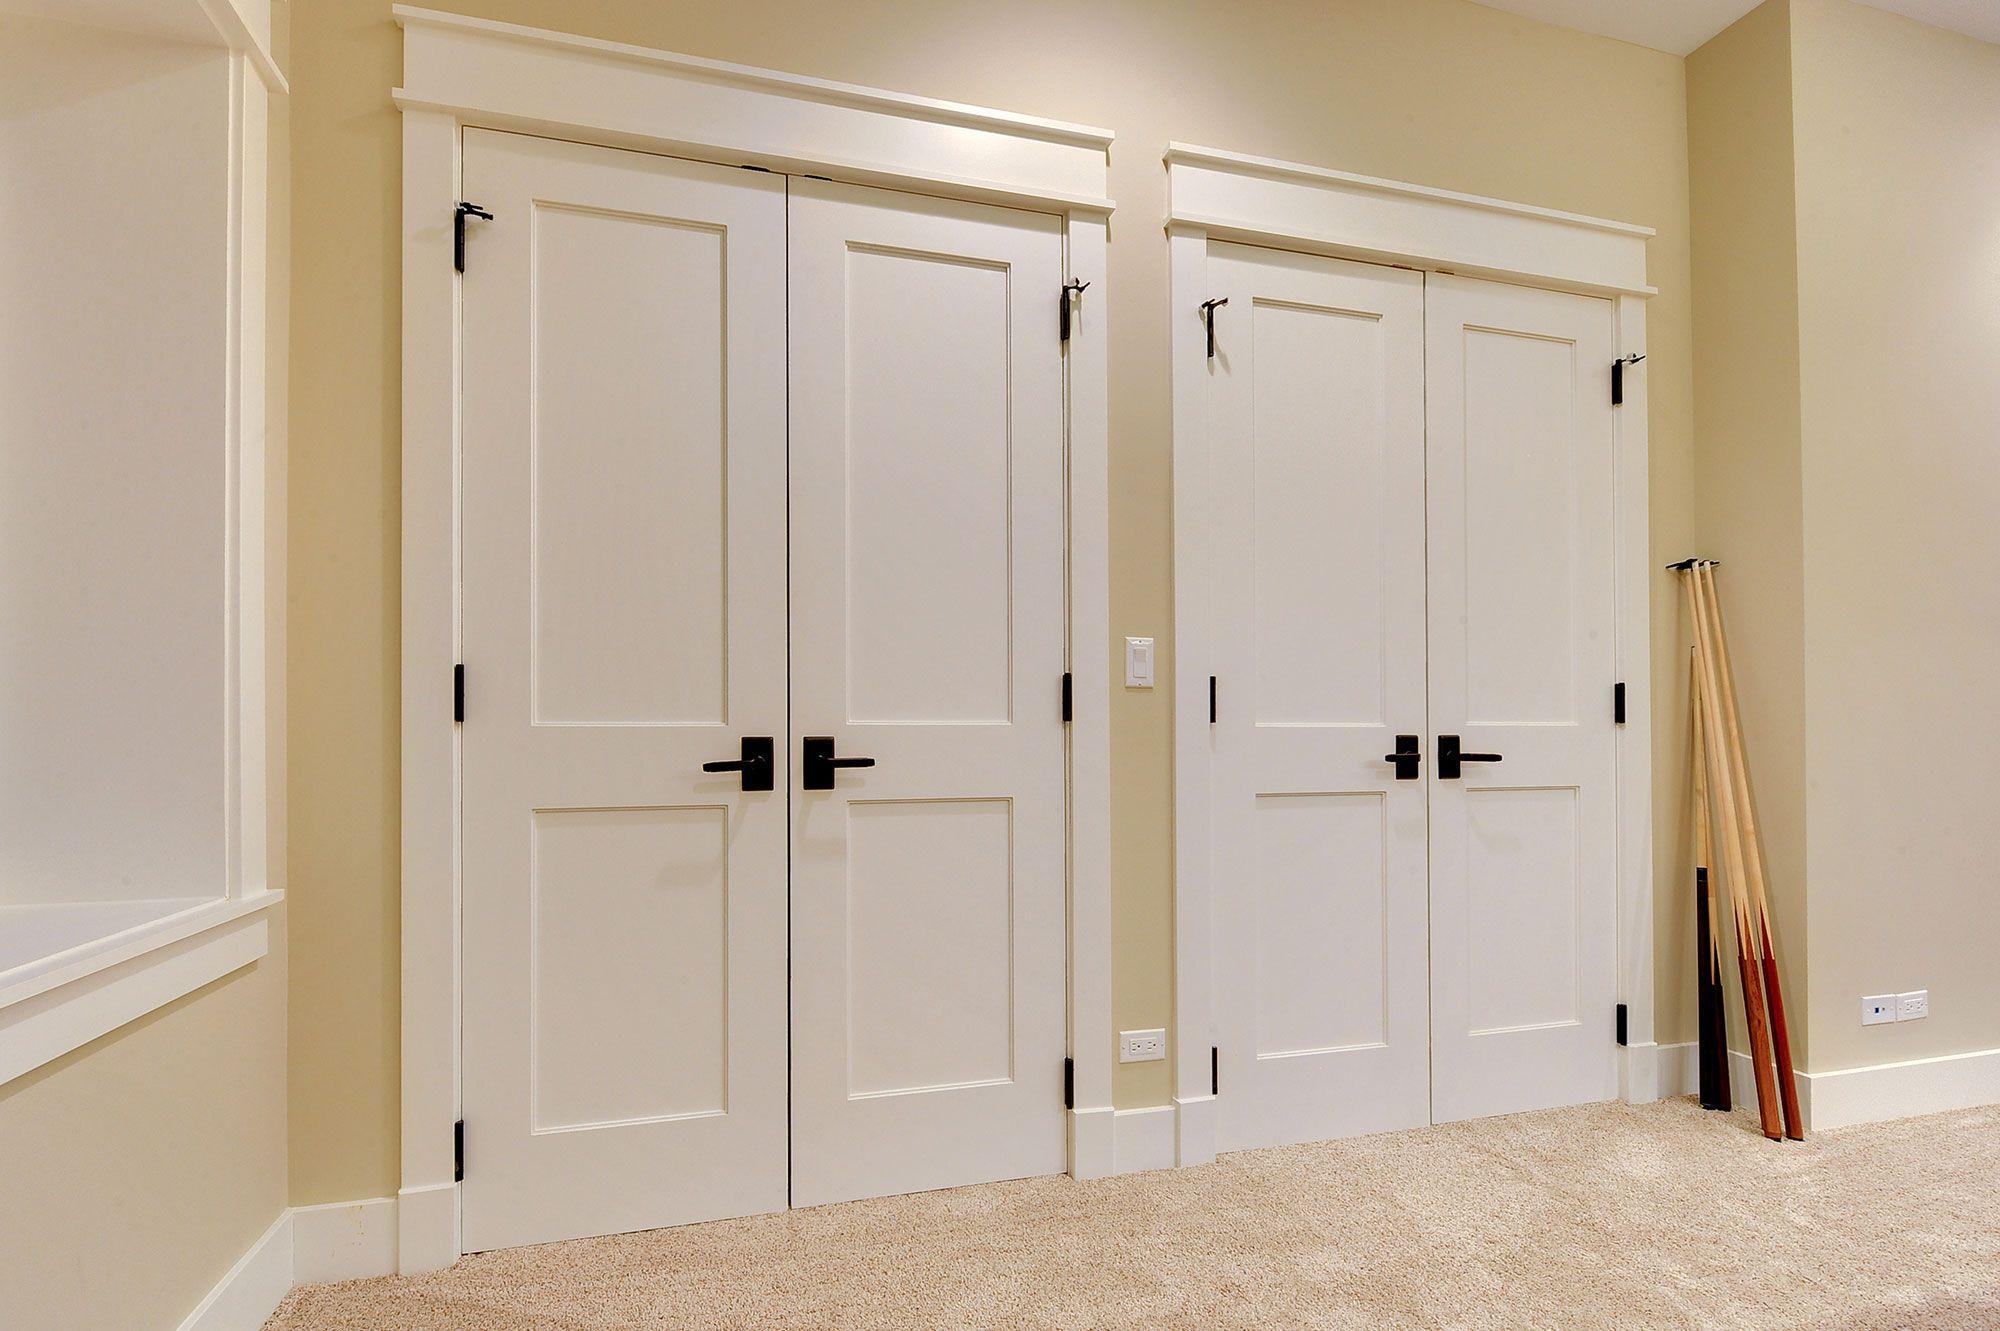 Superb 803 Solar Glenview   Basement Closet Doors   Globex Developments Custom  Homes